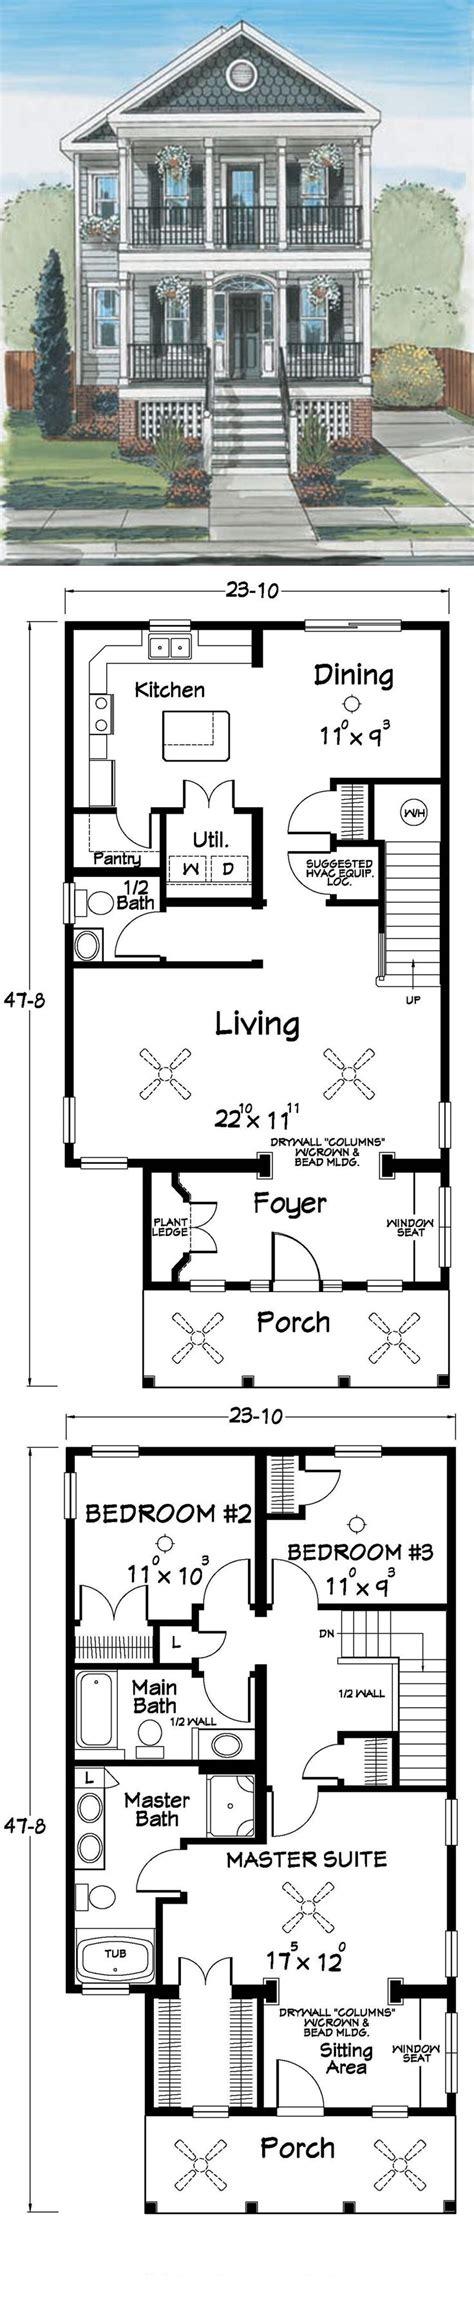 Best 25  Sims3 house ideas on Pinterest   Sims 2 house